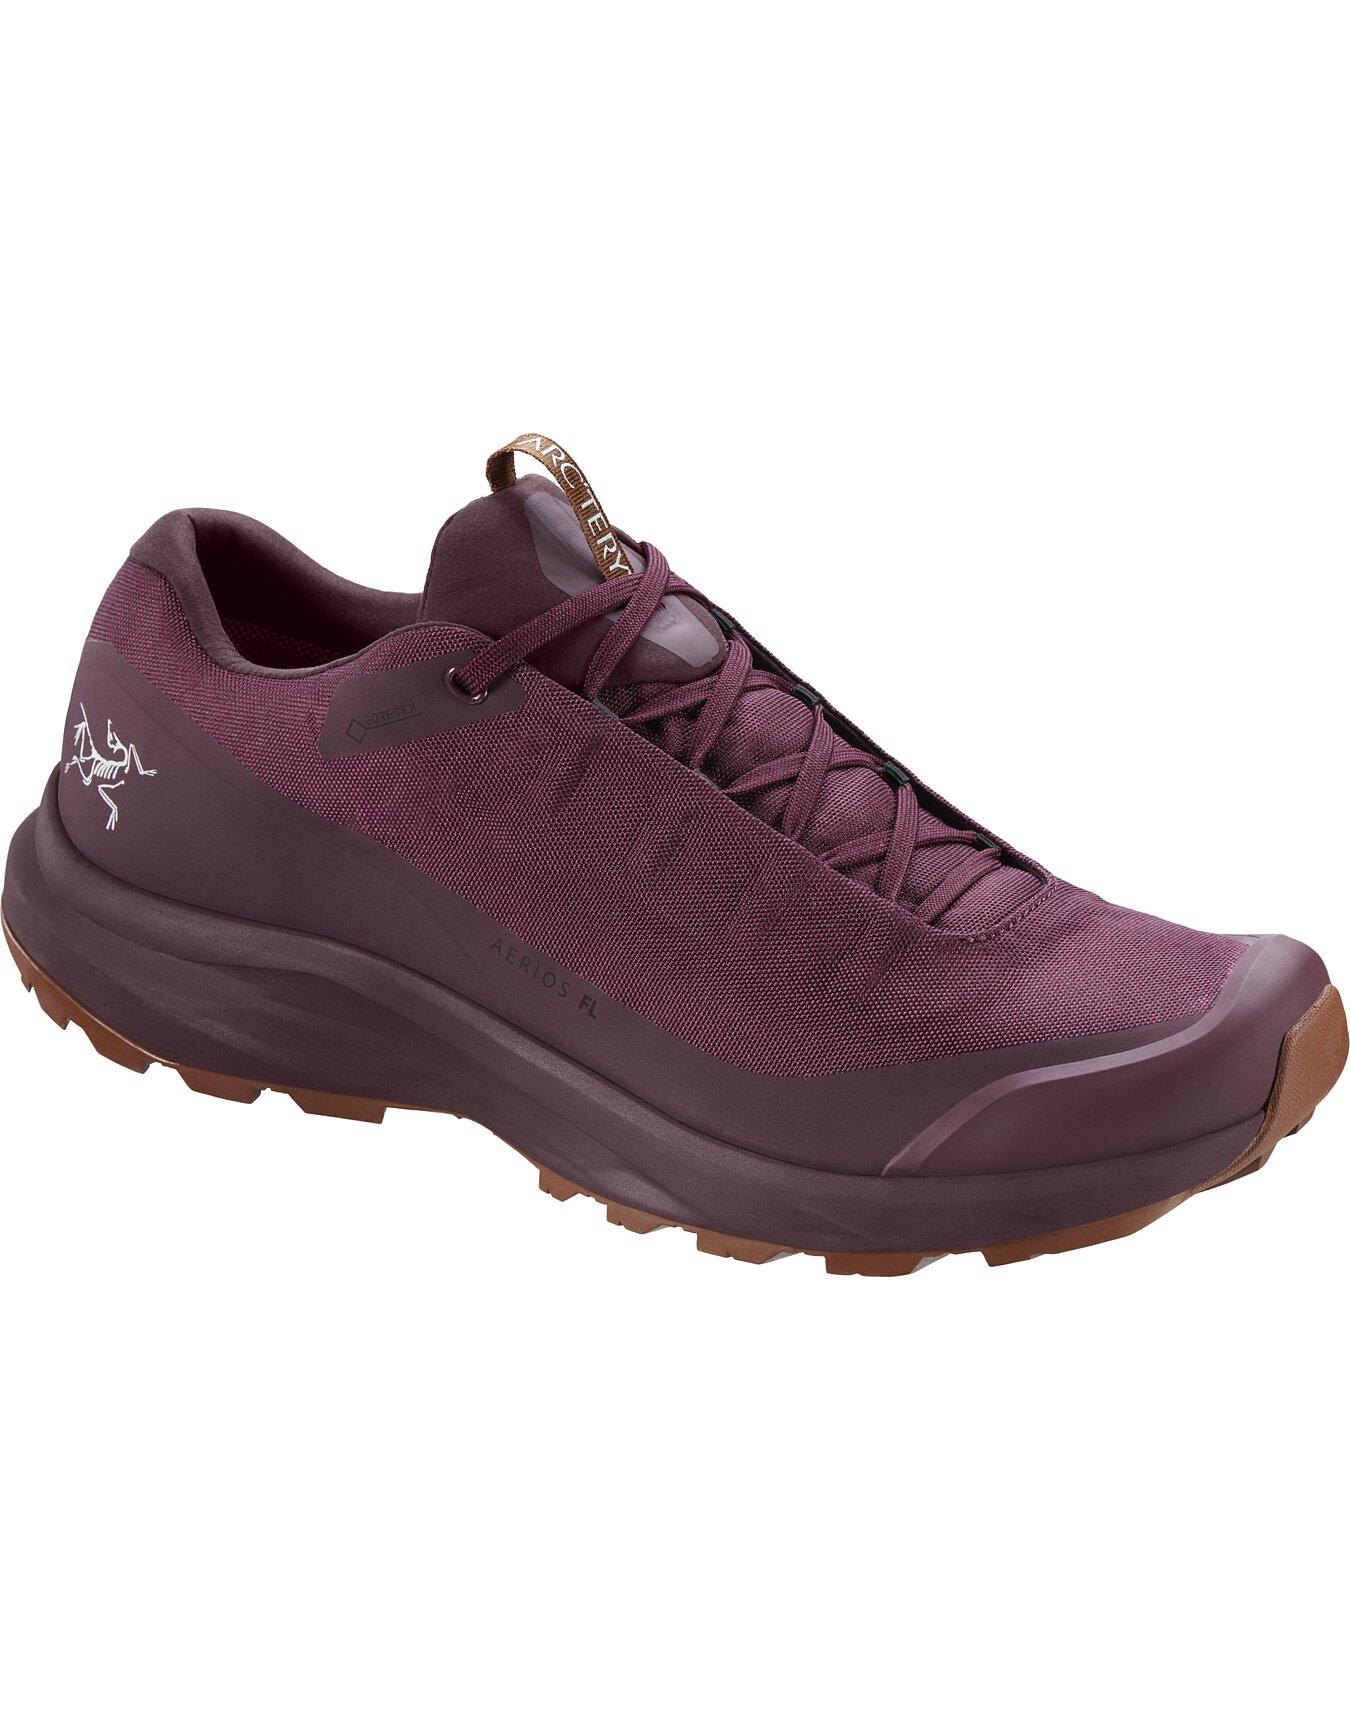 Aerios FL GTX Shoe Men's